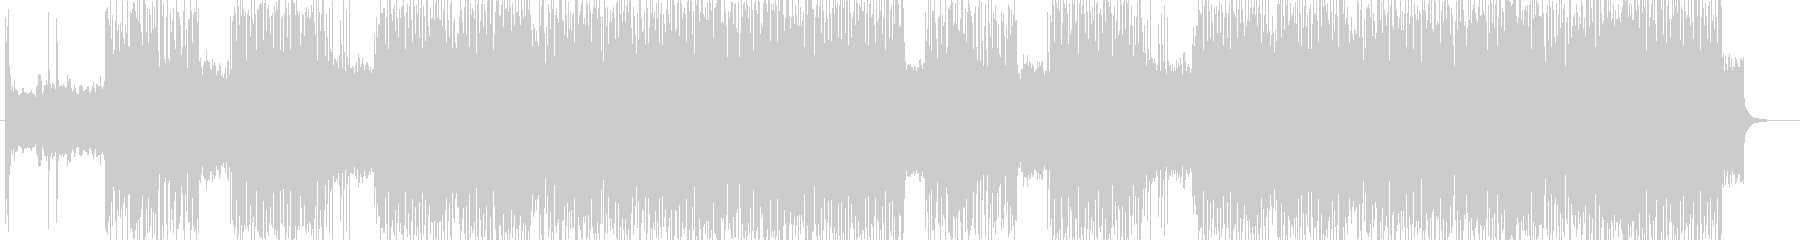 「HR/HM」「DARK」BGM216の未再生の波形